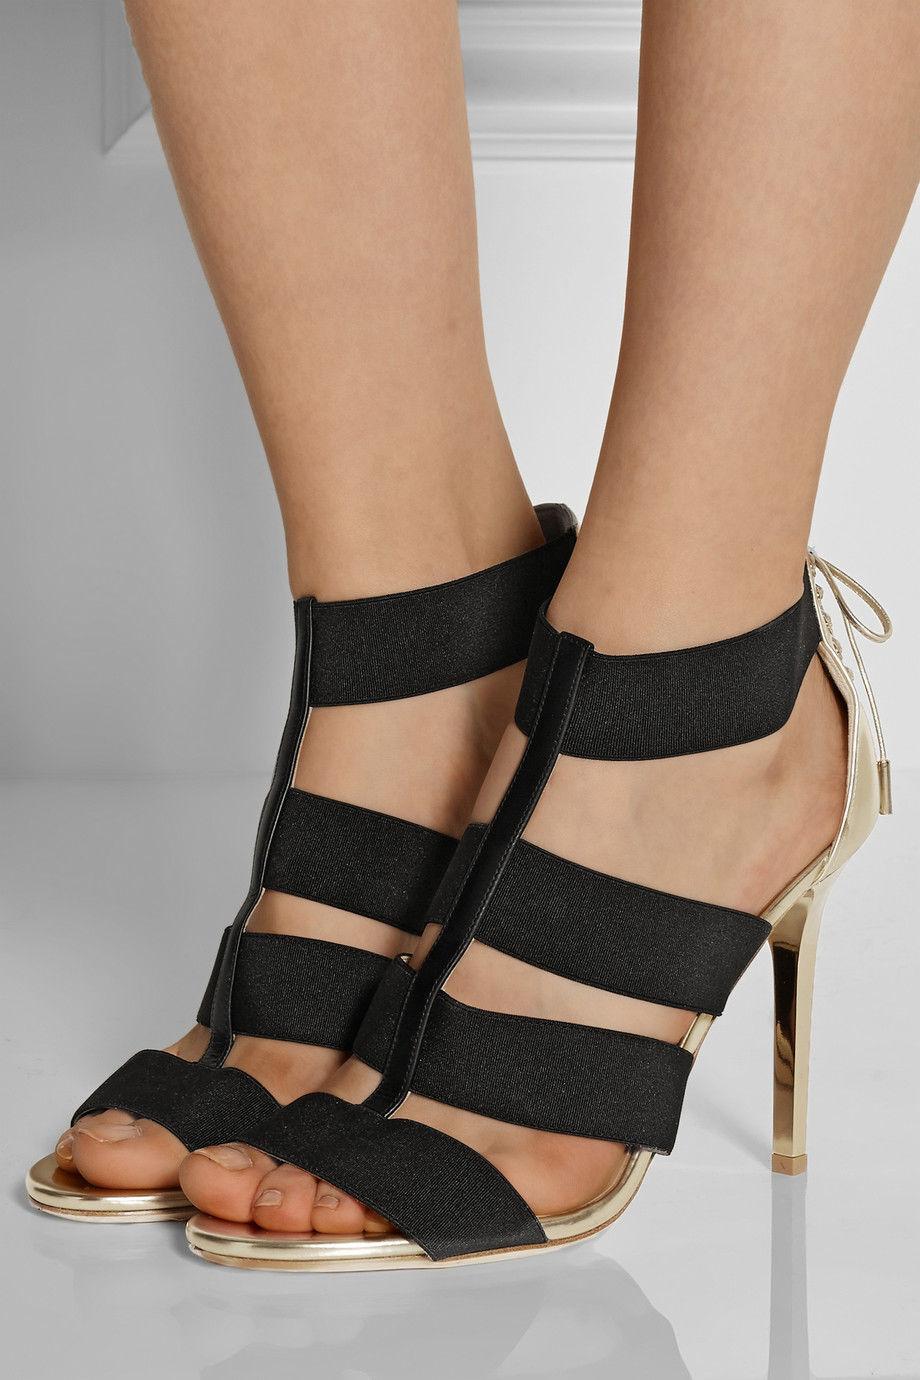 NIB  950 Jimmy Choo DARIO gold Leather & Black Elastic Ankle Sandal shoes 38.5-8